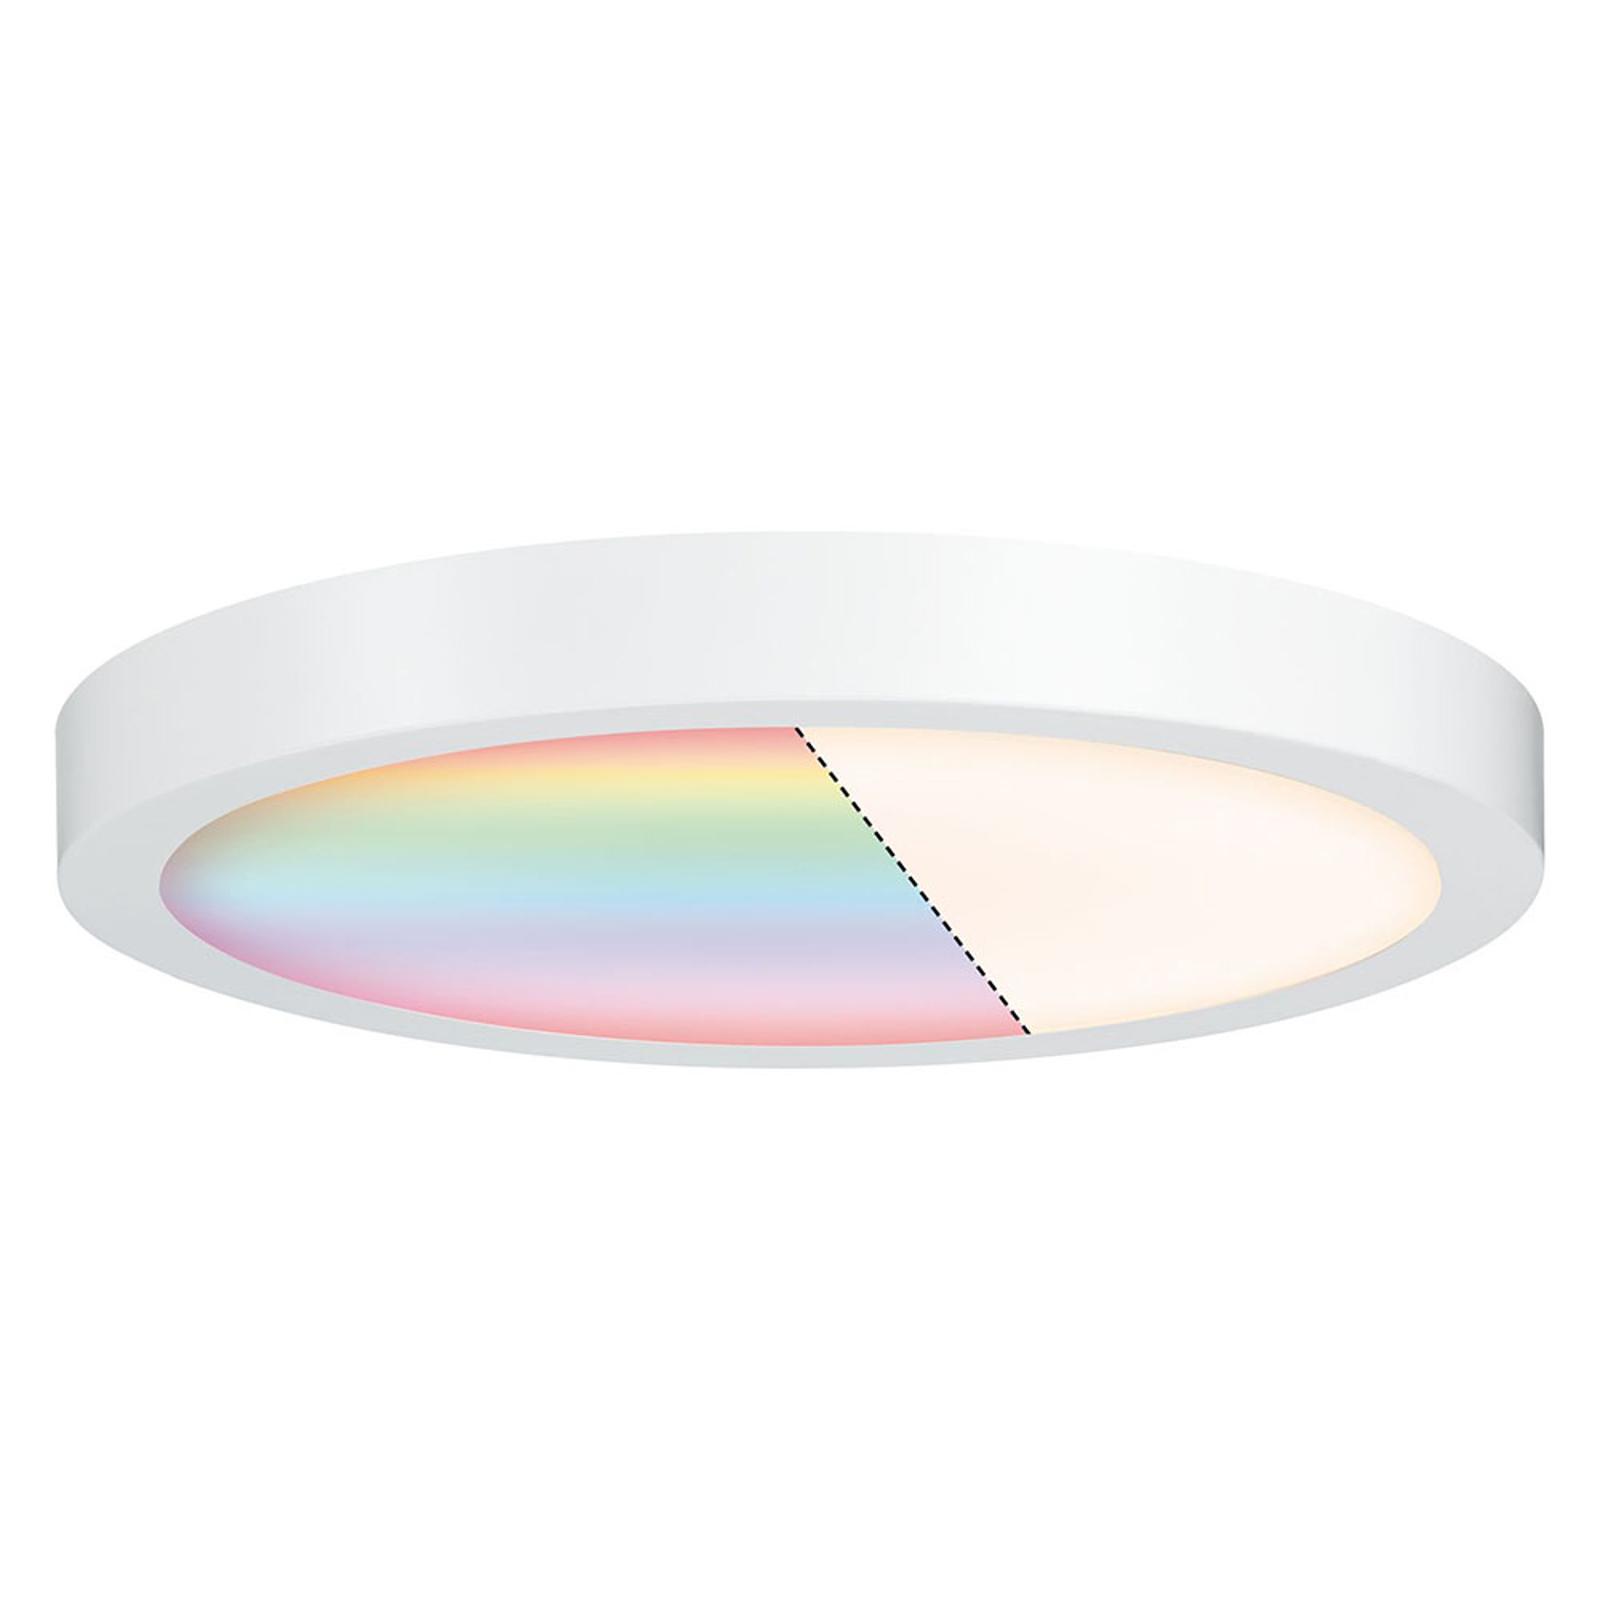 Dove acquistare Paulmann Cesena ZigBee plafoniera LED, Ø 40cm